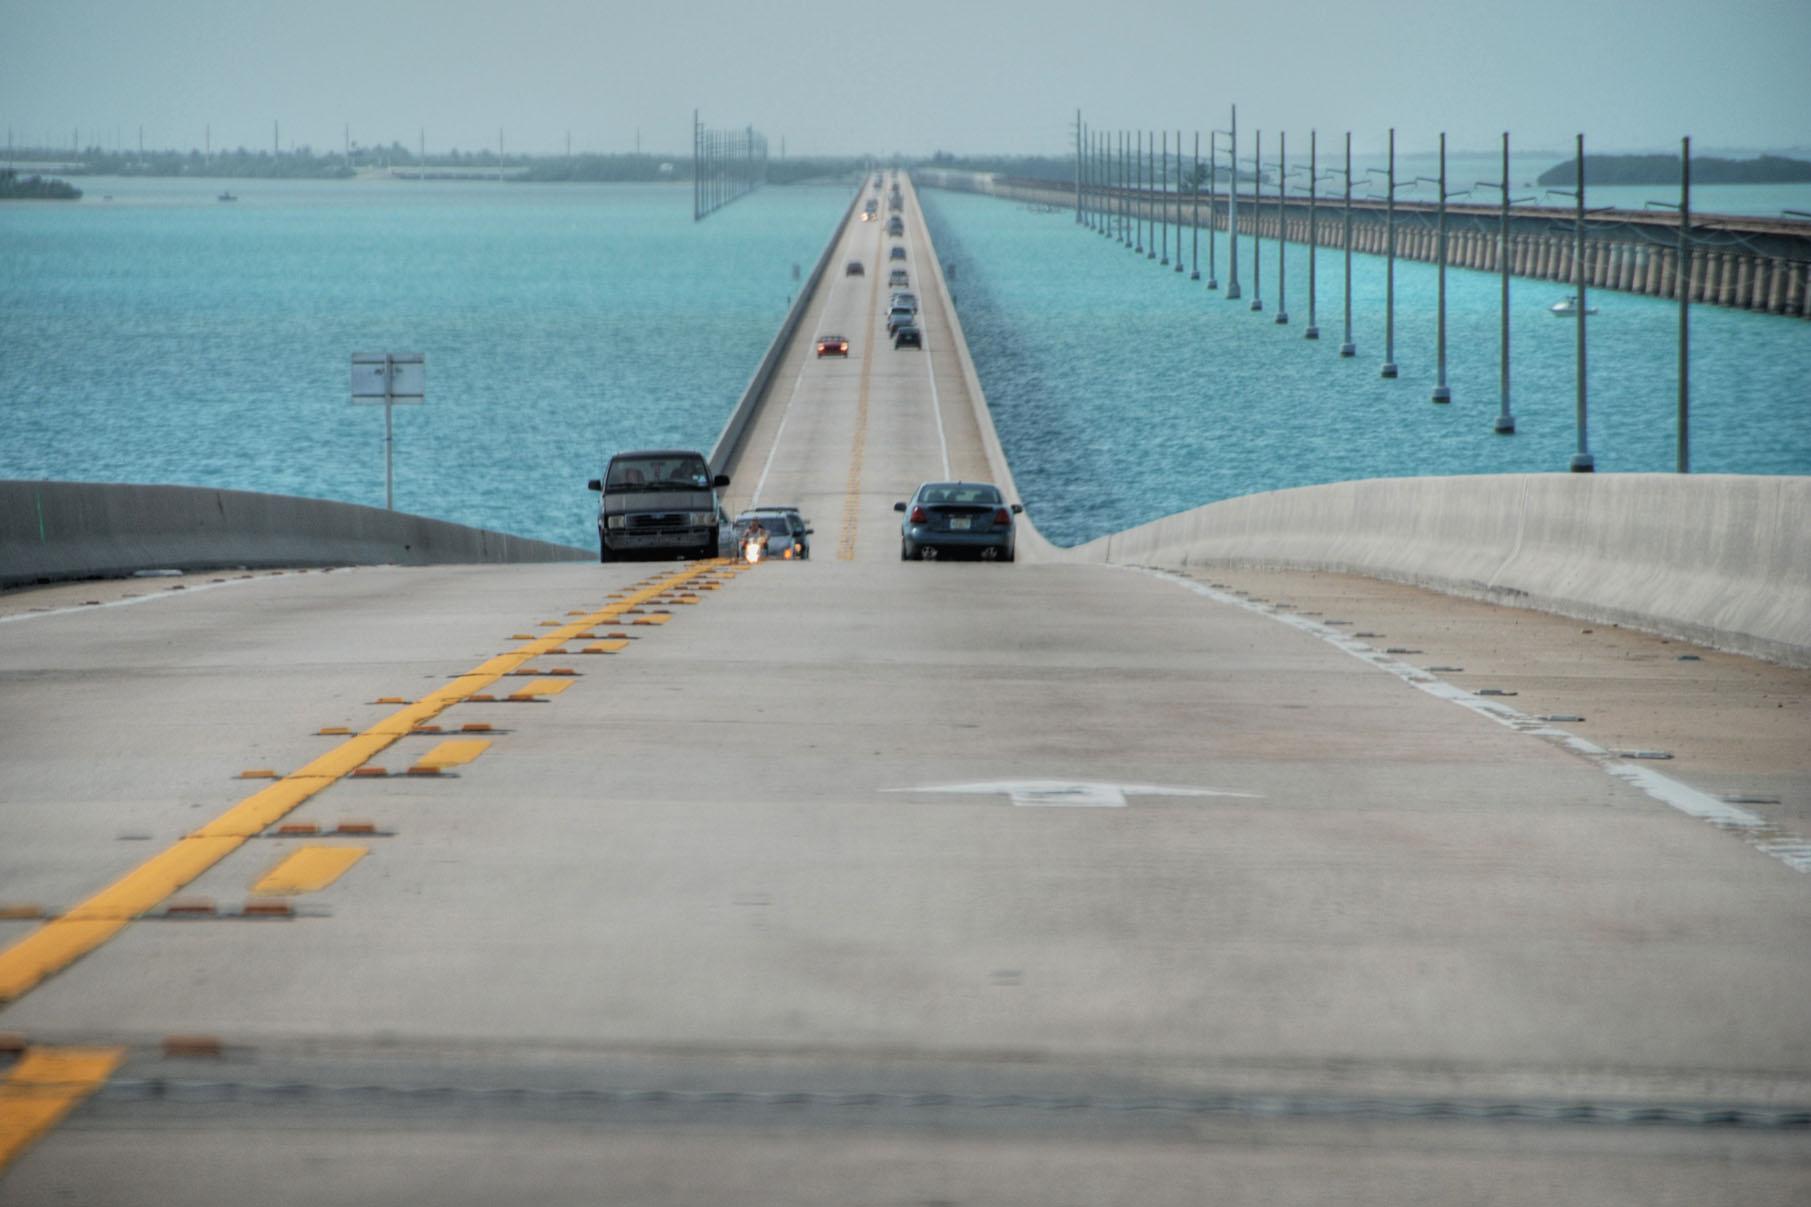 Keys Islands Interstate, Florida, Januar, America, Sea, Water, View, HQ Photo